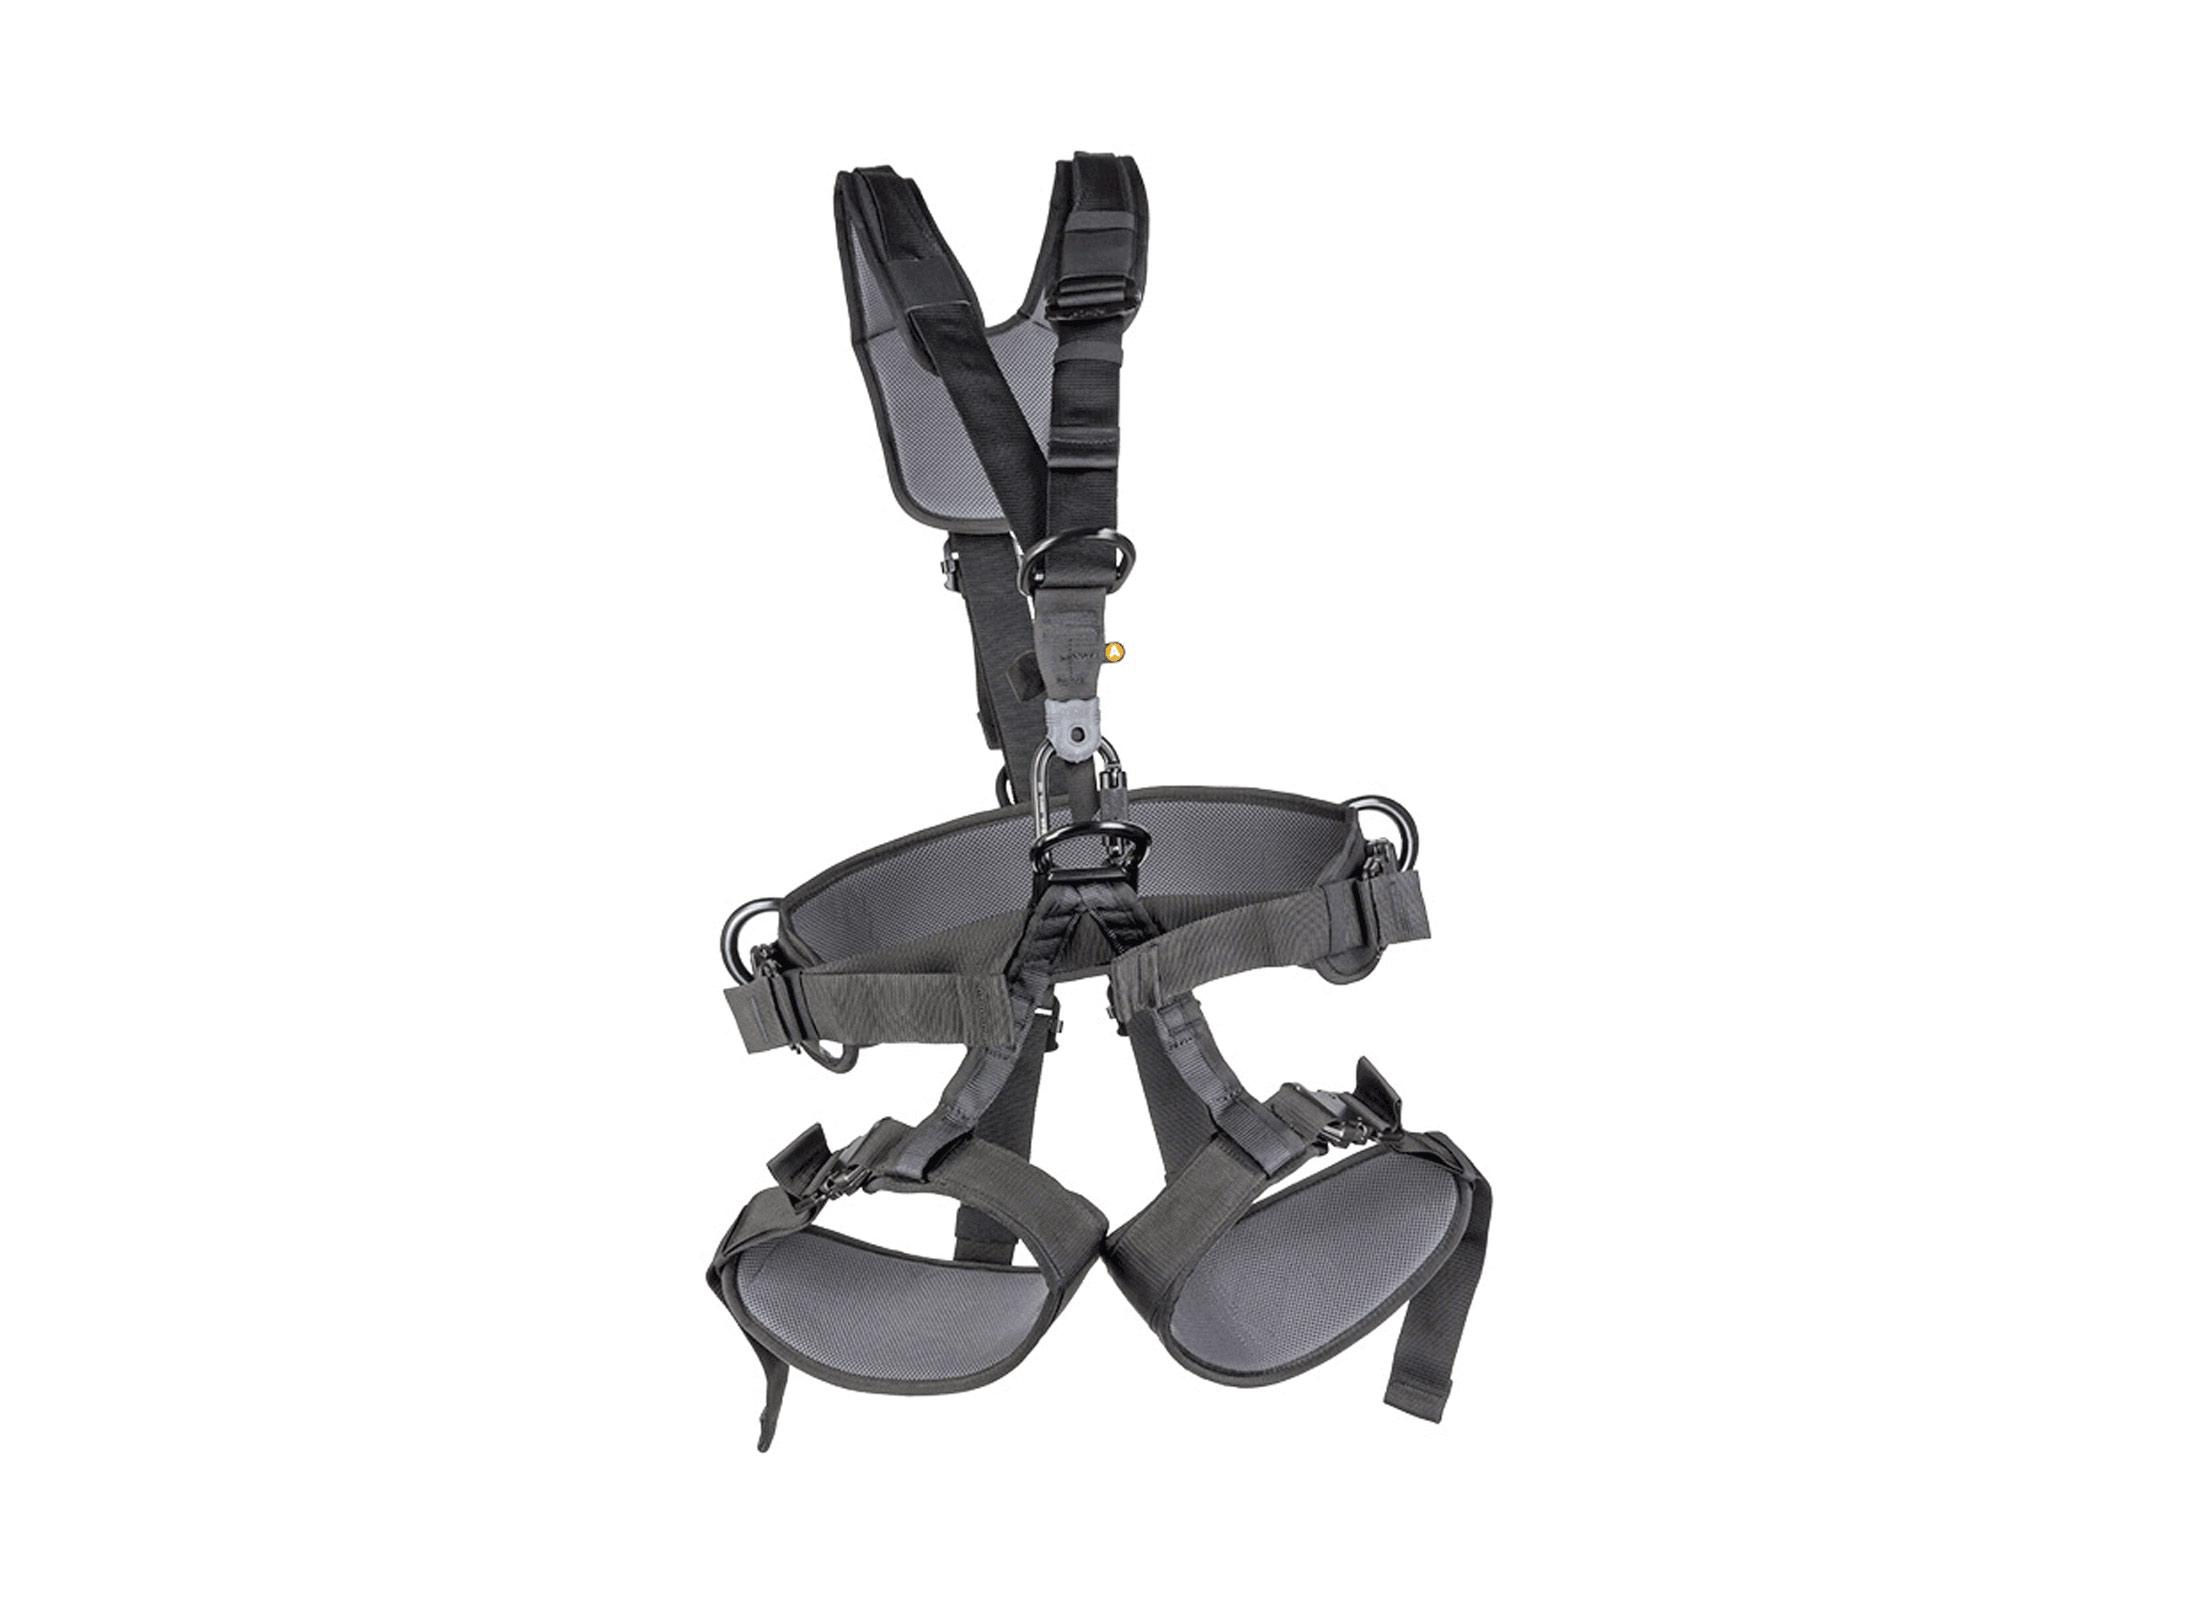 Sweetpro Tz Sa03 Safety Harness Black Size L Xl Online At Low 1